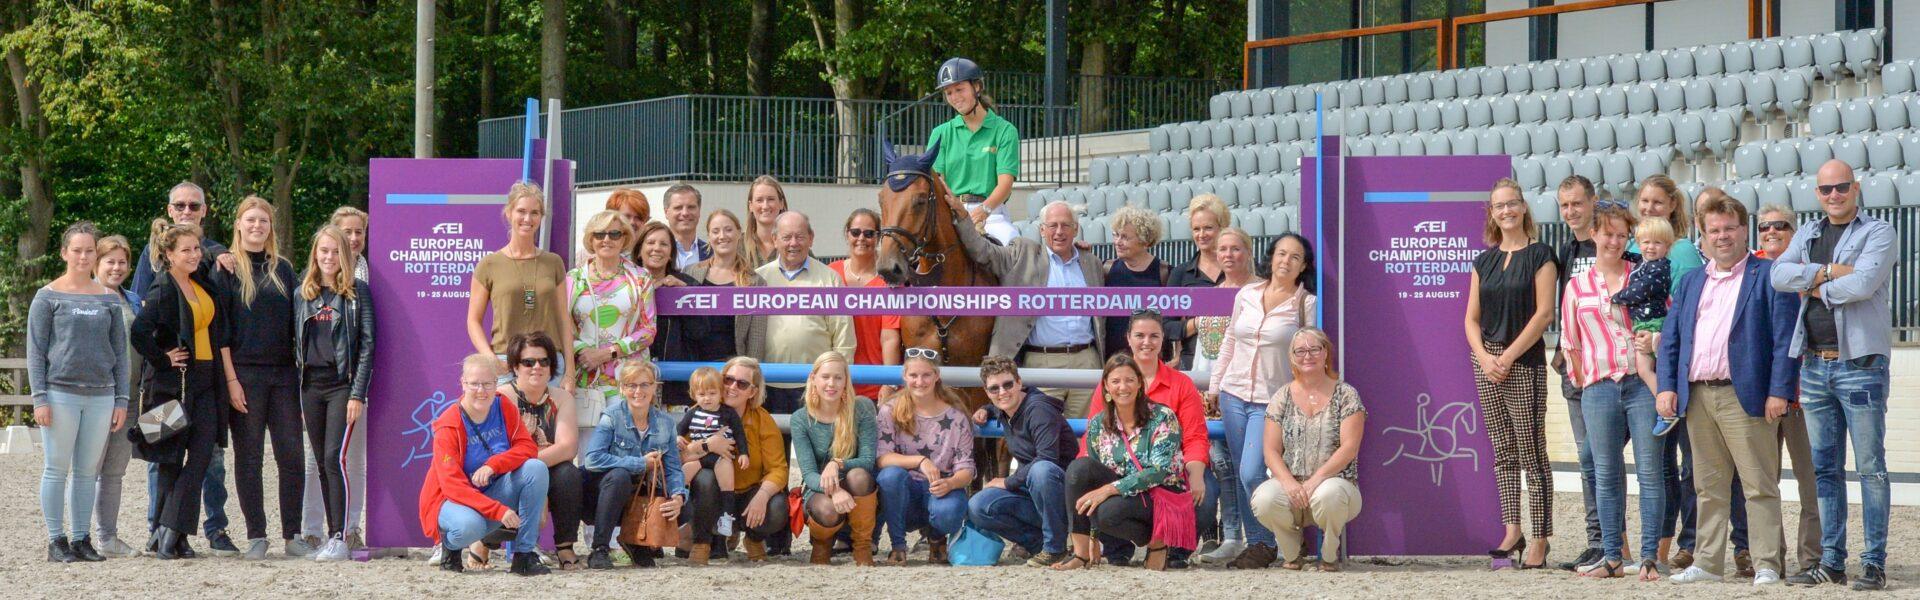 FEI European Championship 2019 Rotterdam Sponsors NL